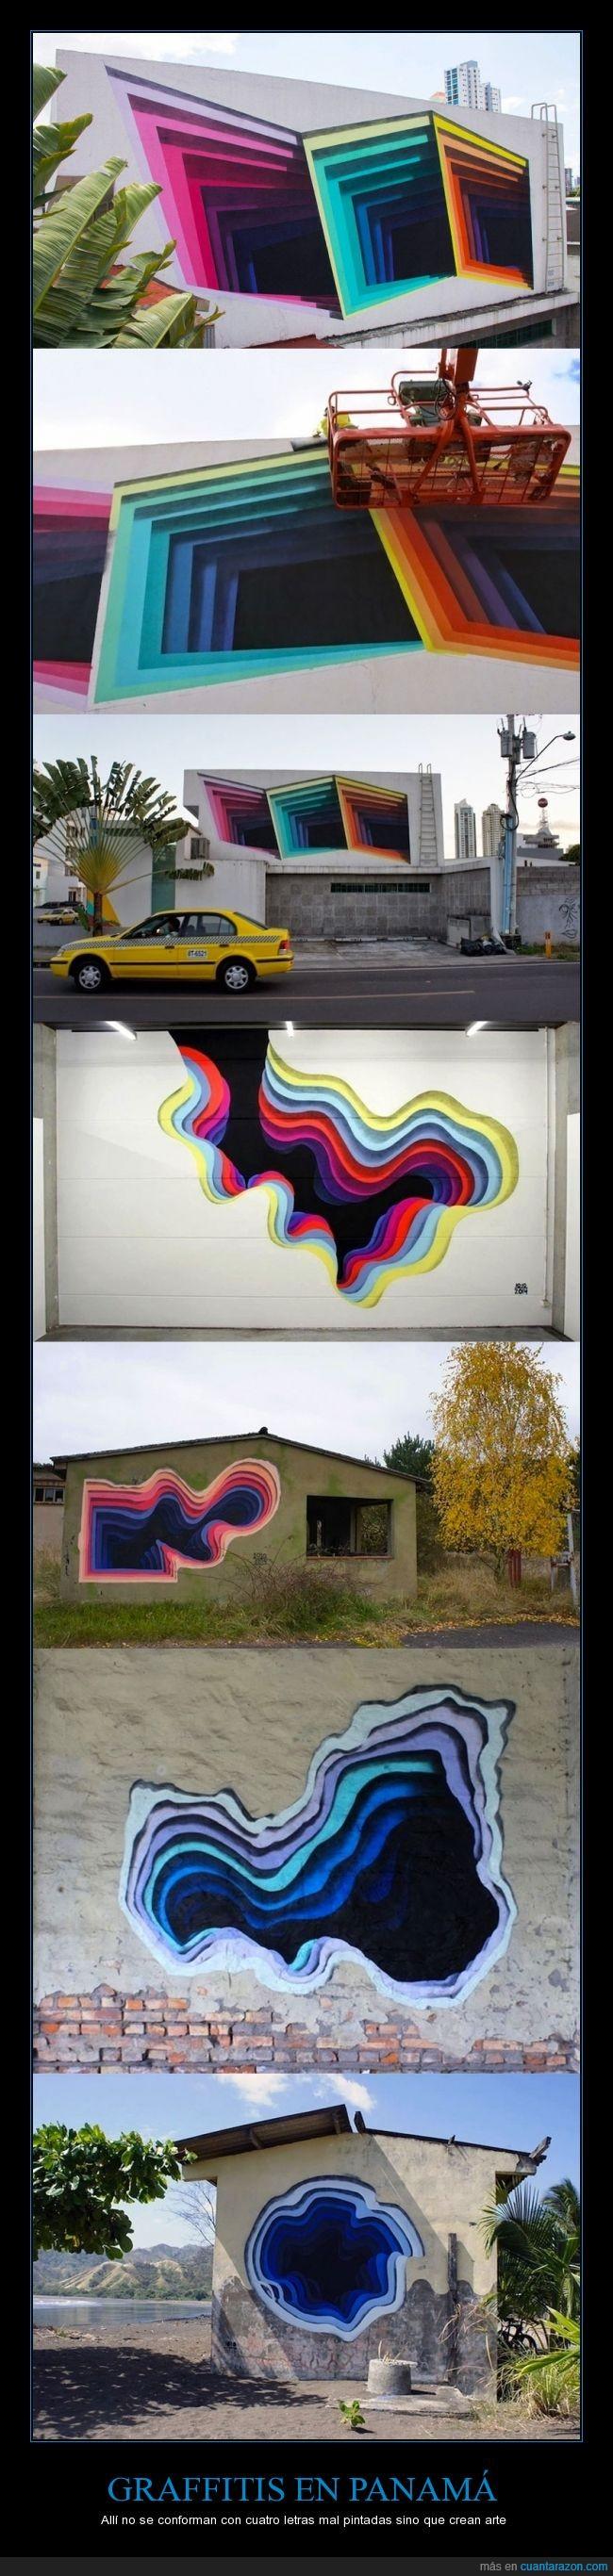 agujero,arte,callejero,color,escala,graffiti,panama,profundidad,urbano